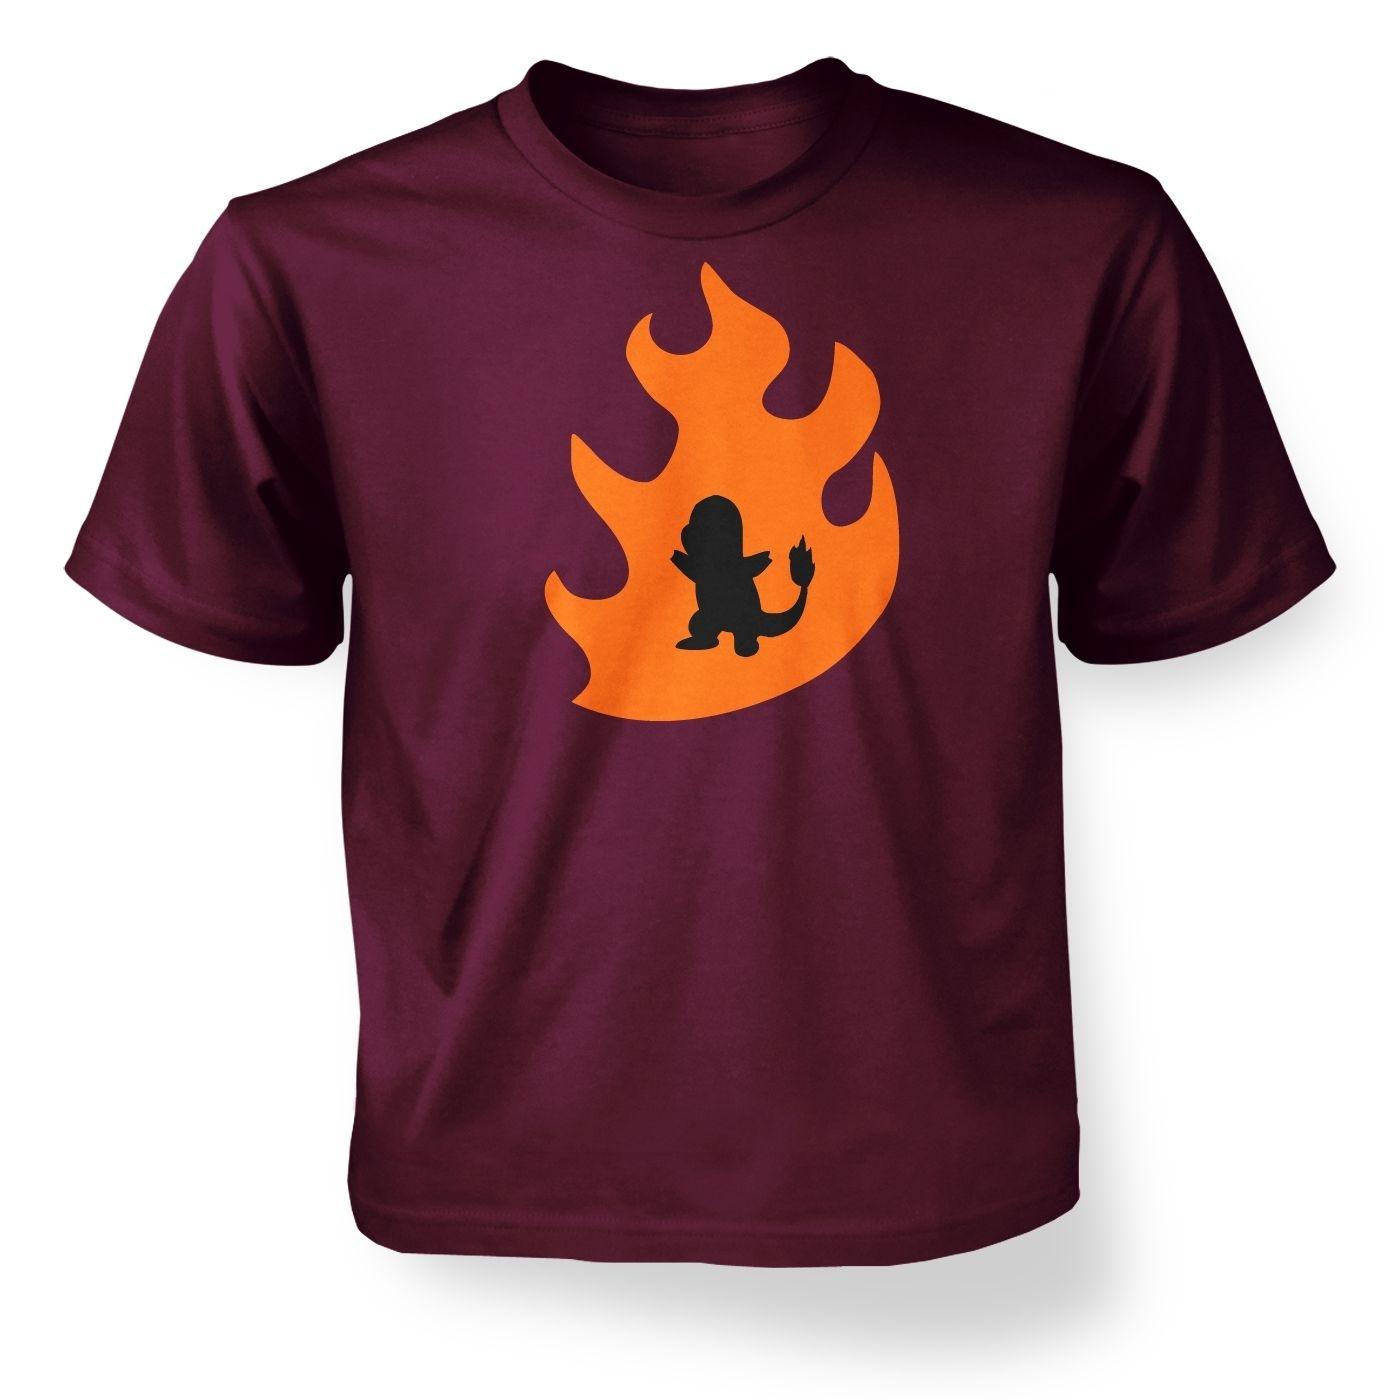 Kids' Orange Charmander Silhouette T-Shirt - Inspired by Pokemon